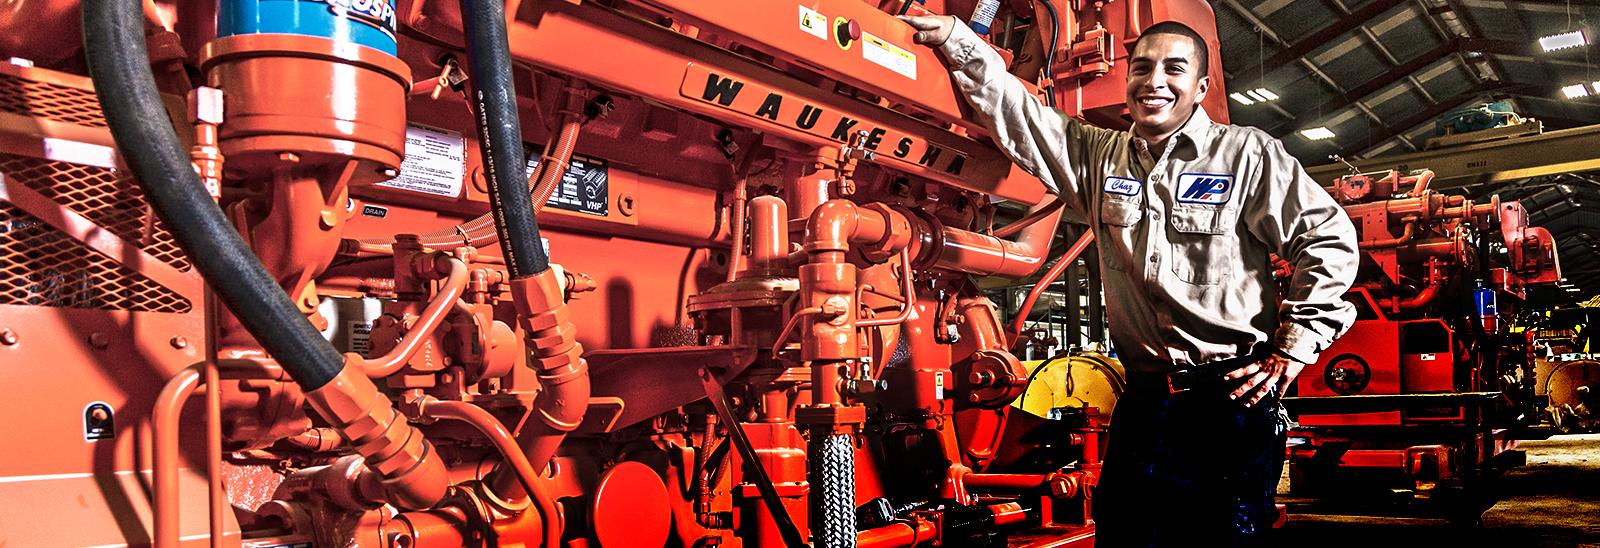 Waukesha pearce industries locations